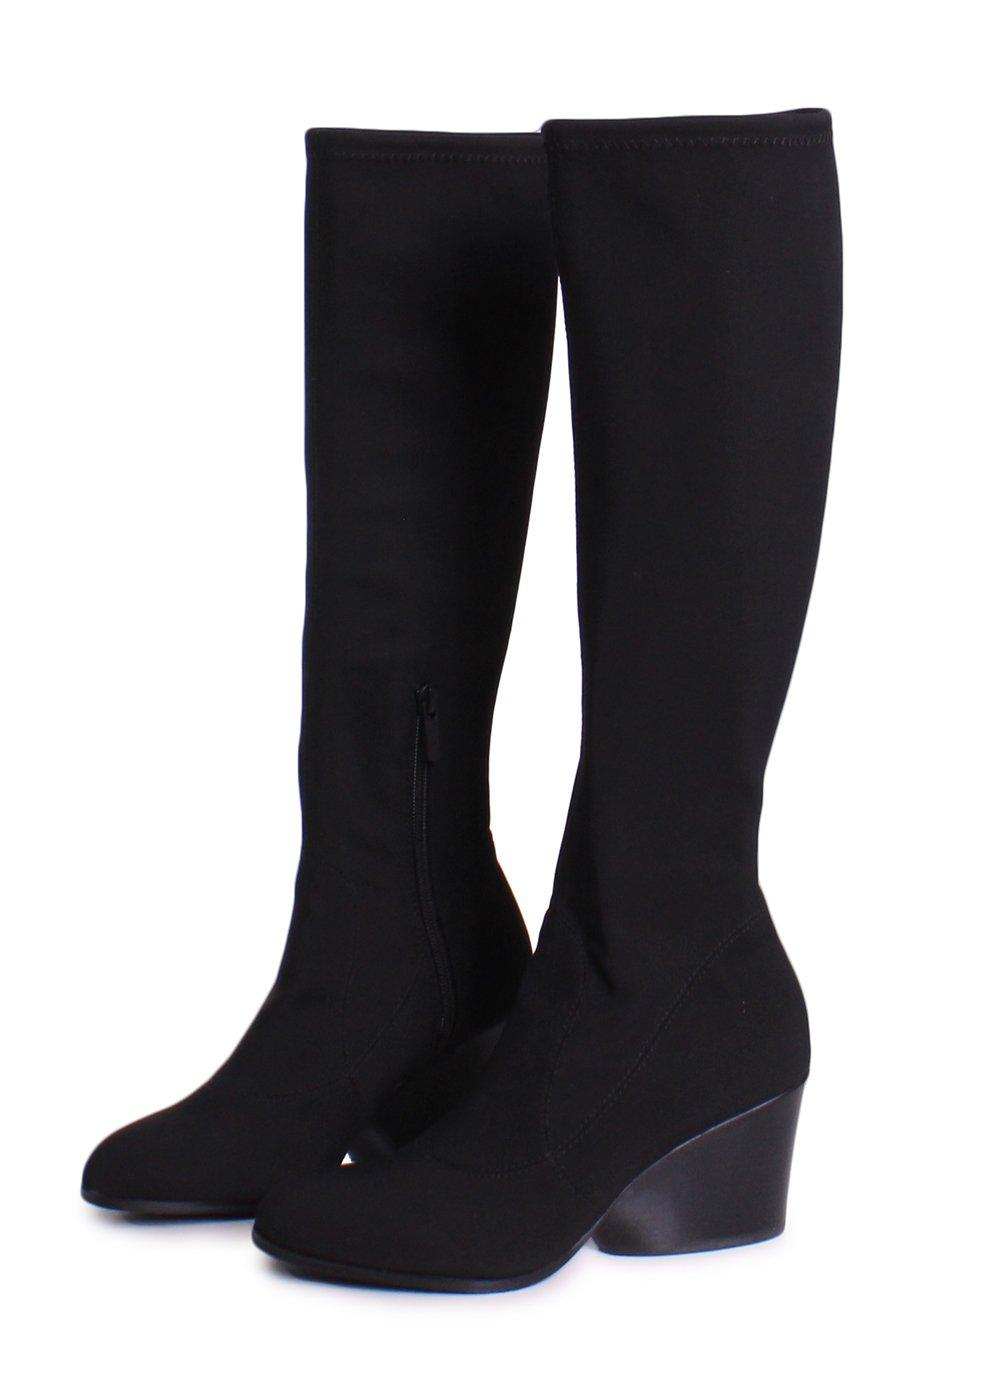 Donald J Pliner Patsy Crepe Elastic Knee High Boots in Black Size 7.5